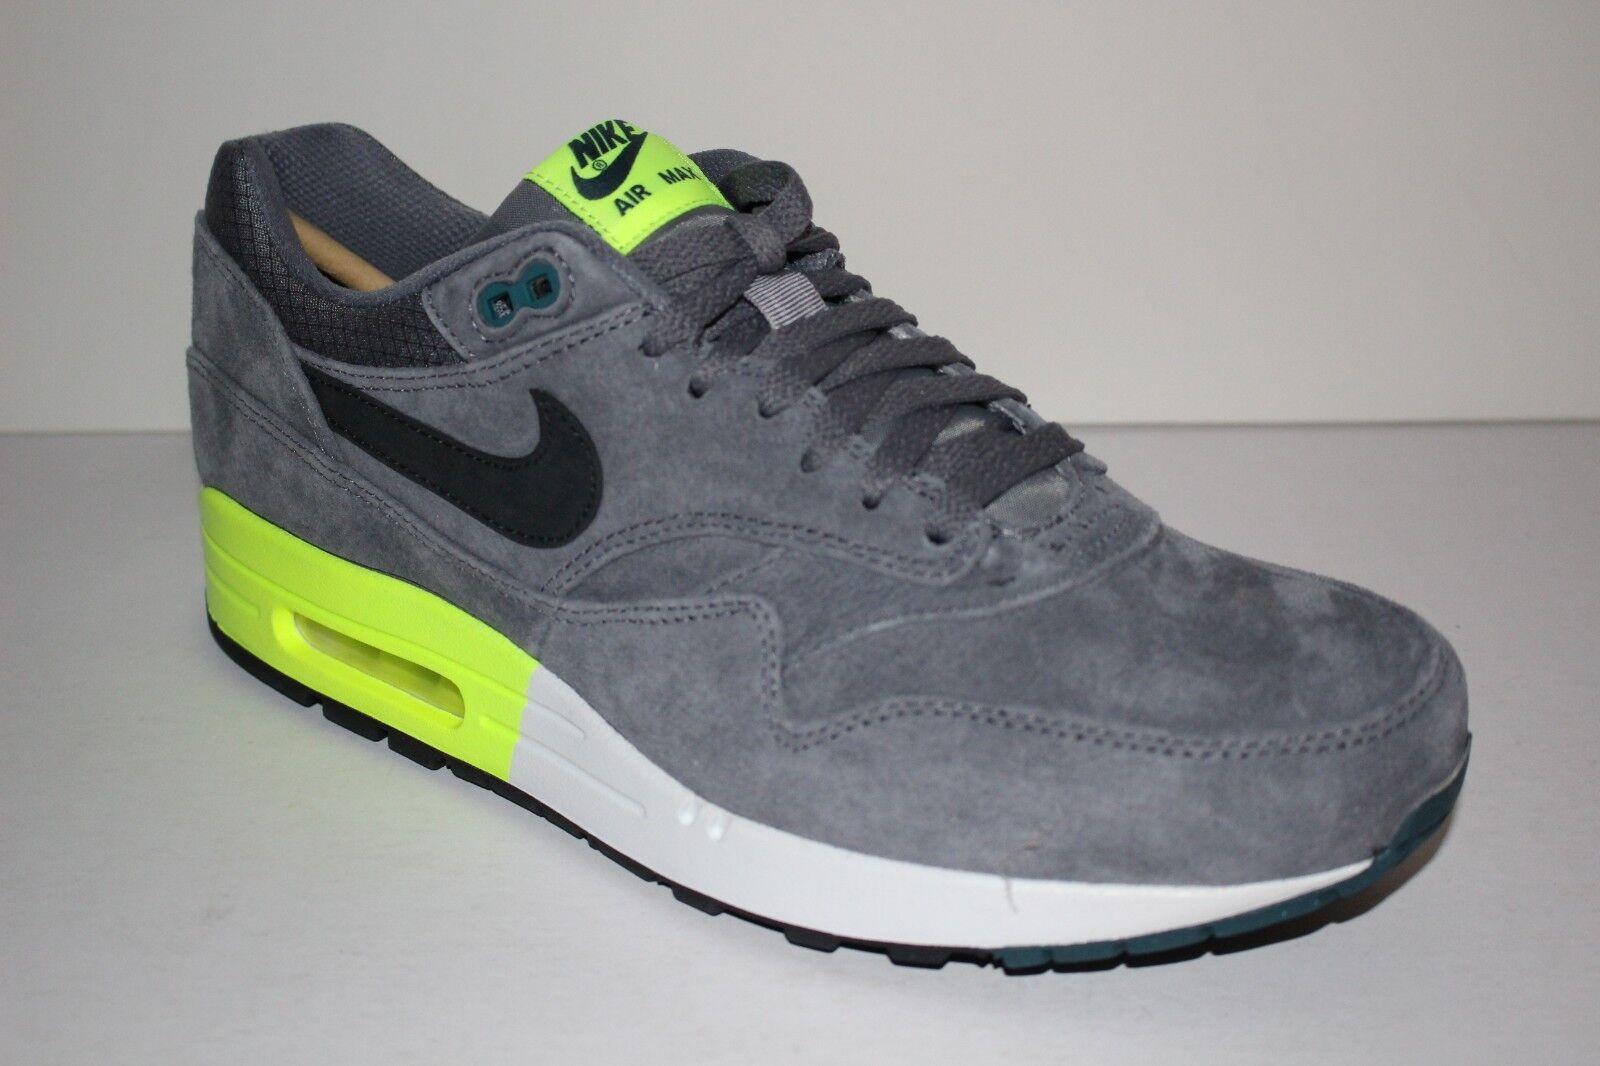 Nike Air Max 1 PRM Men's Sz 11.5 Suede Premium Retro Running shoes Cool Grey Volt